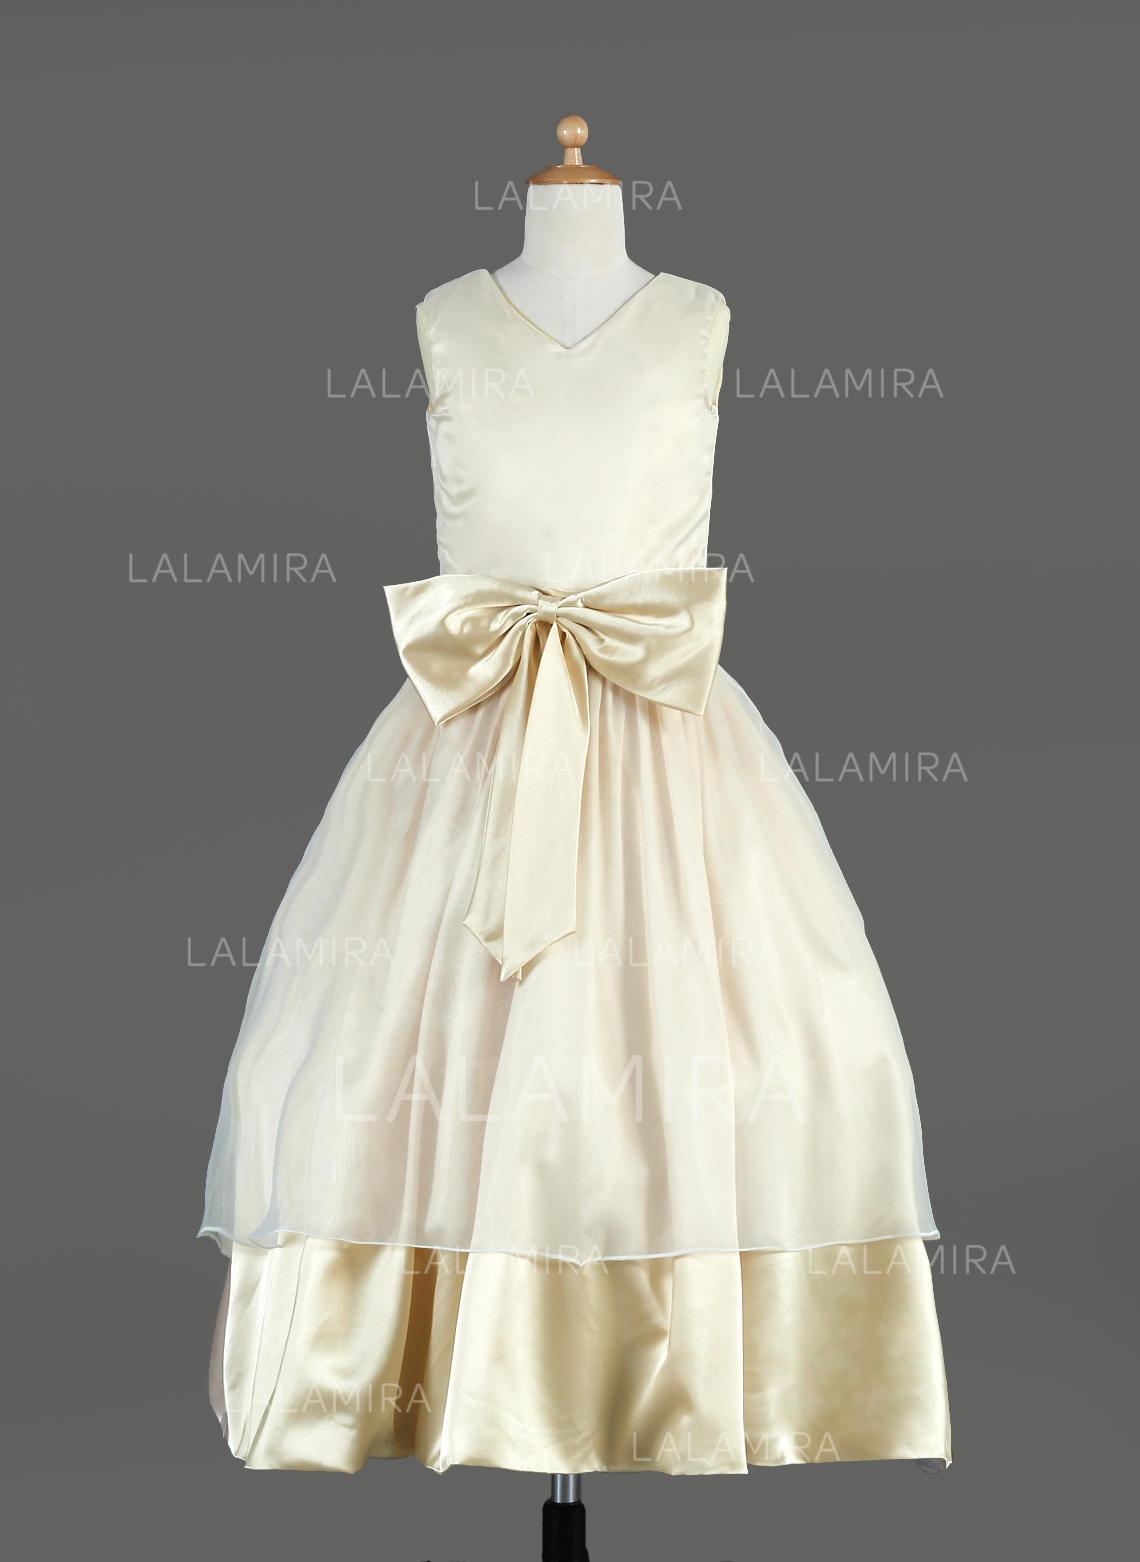 311b33e4266 Sublime Col V Robe Marquise Organza Charmeuse Robes de demoiselle d honneur  - fillette. Loading zoom